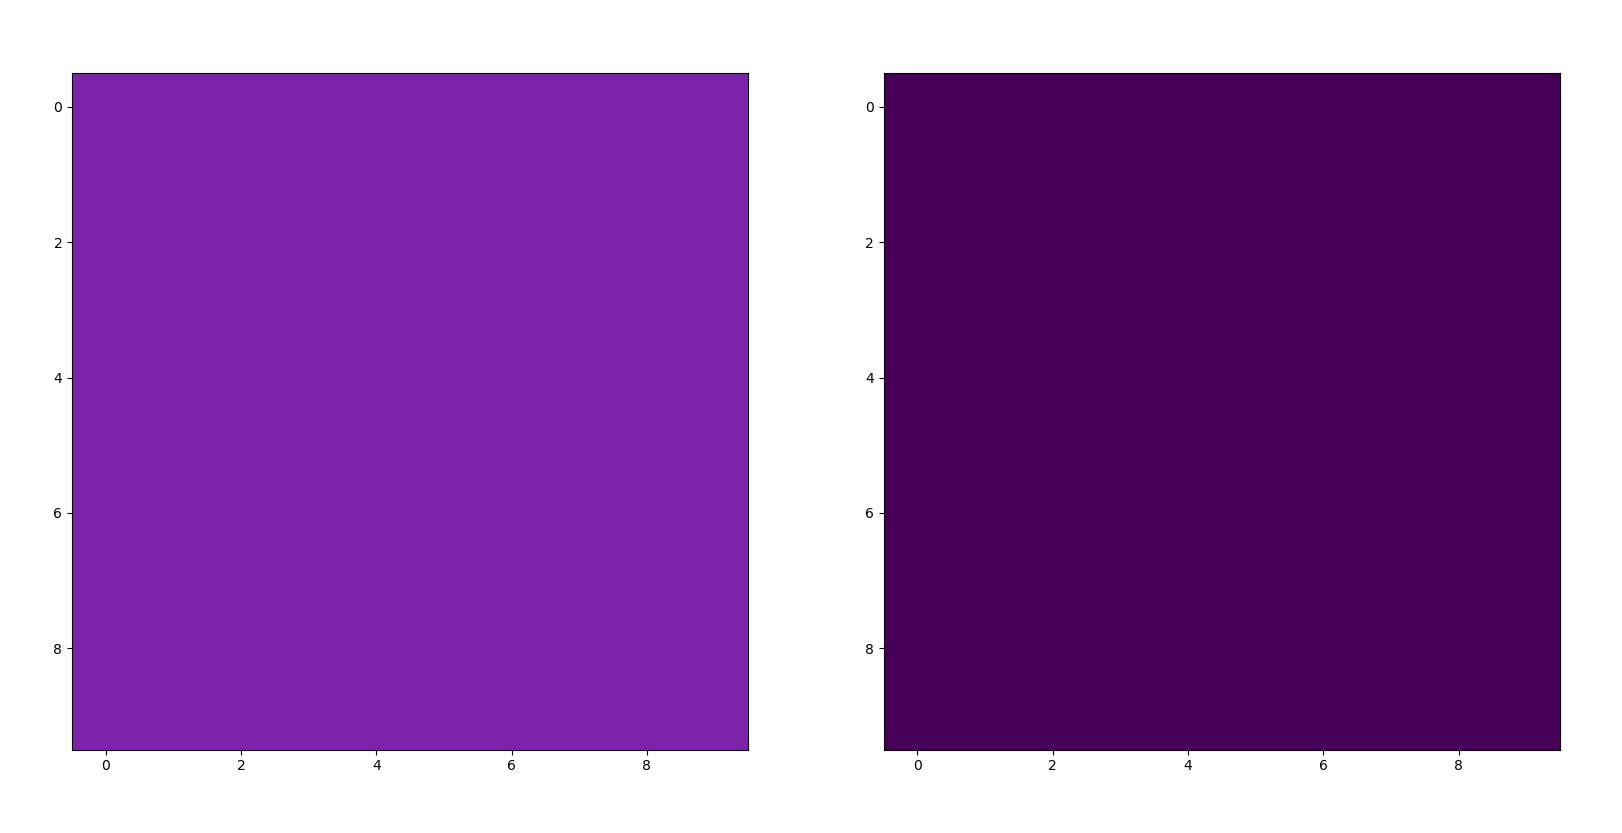 color_range_correct.PNG